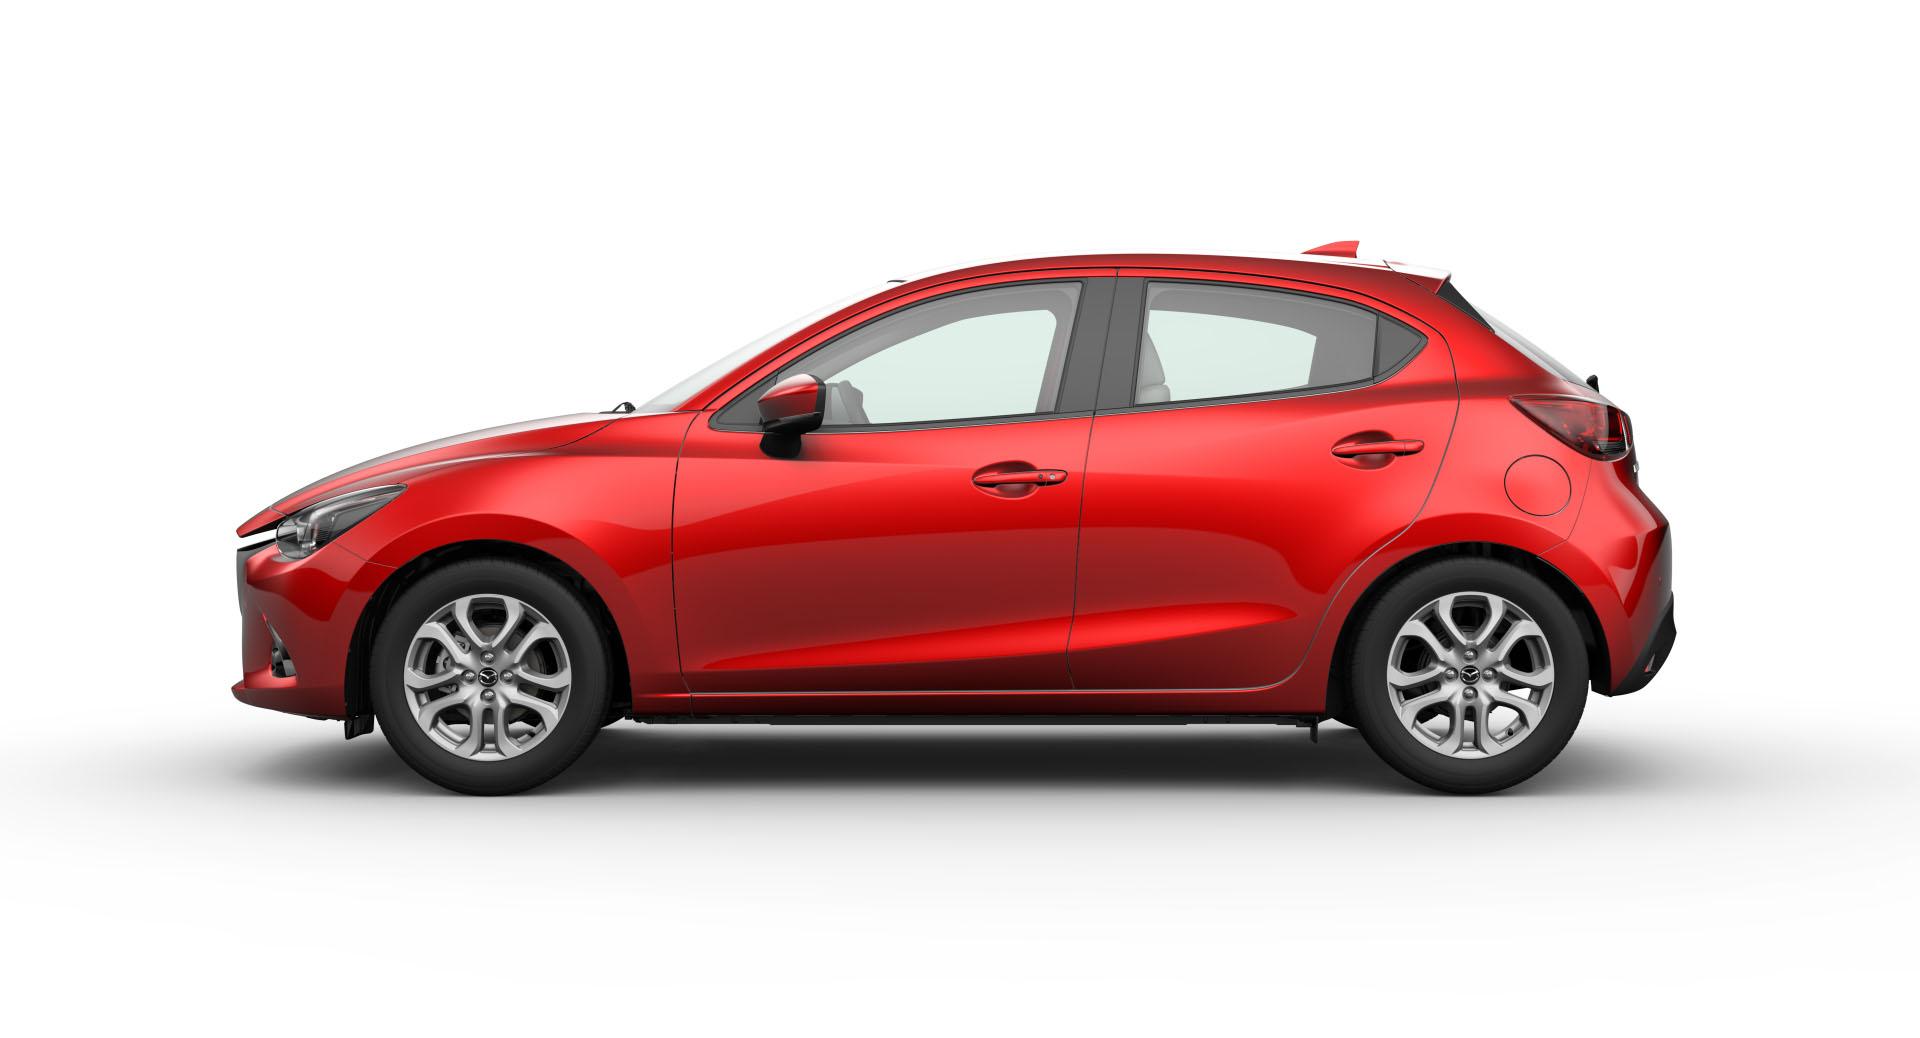 Kelebihan Mazda 2 Tangguh